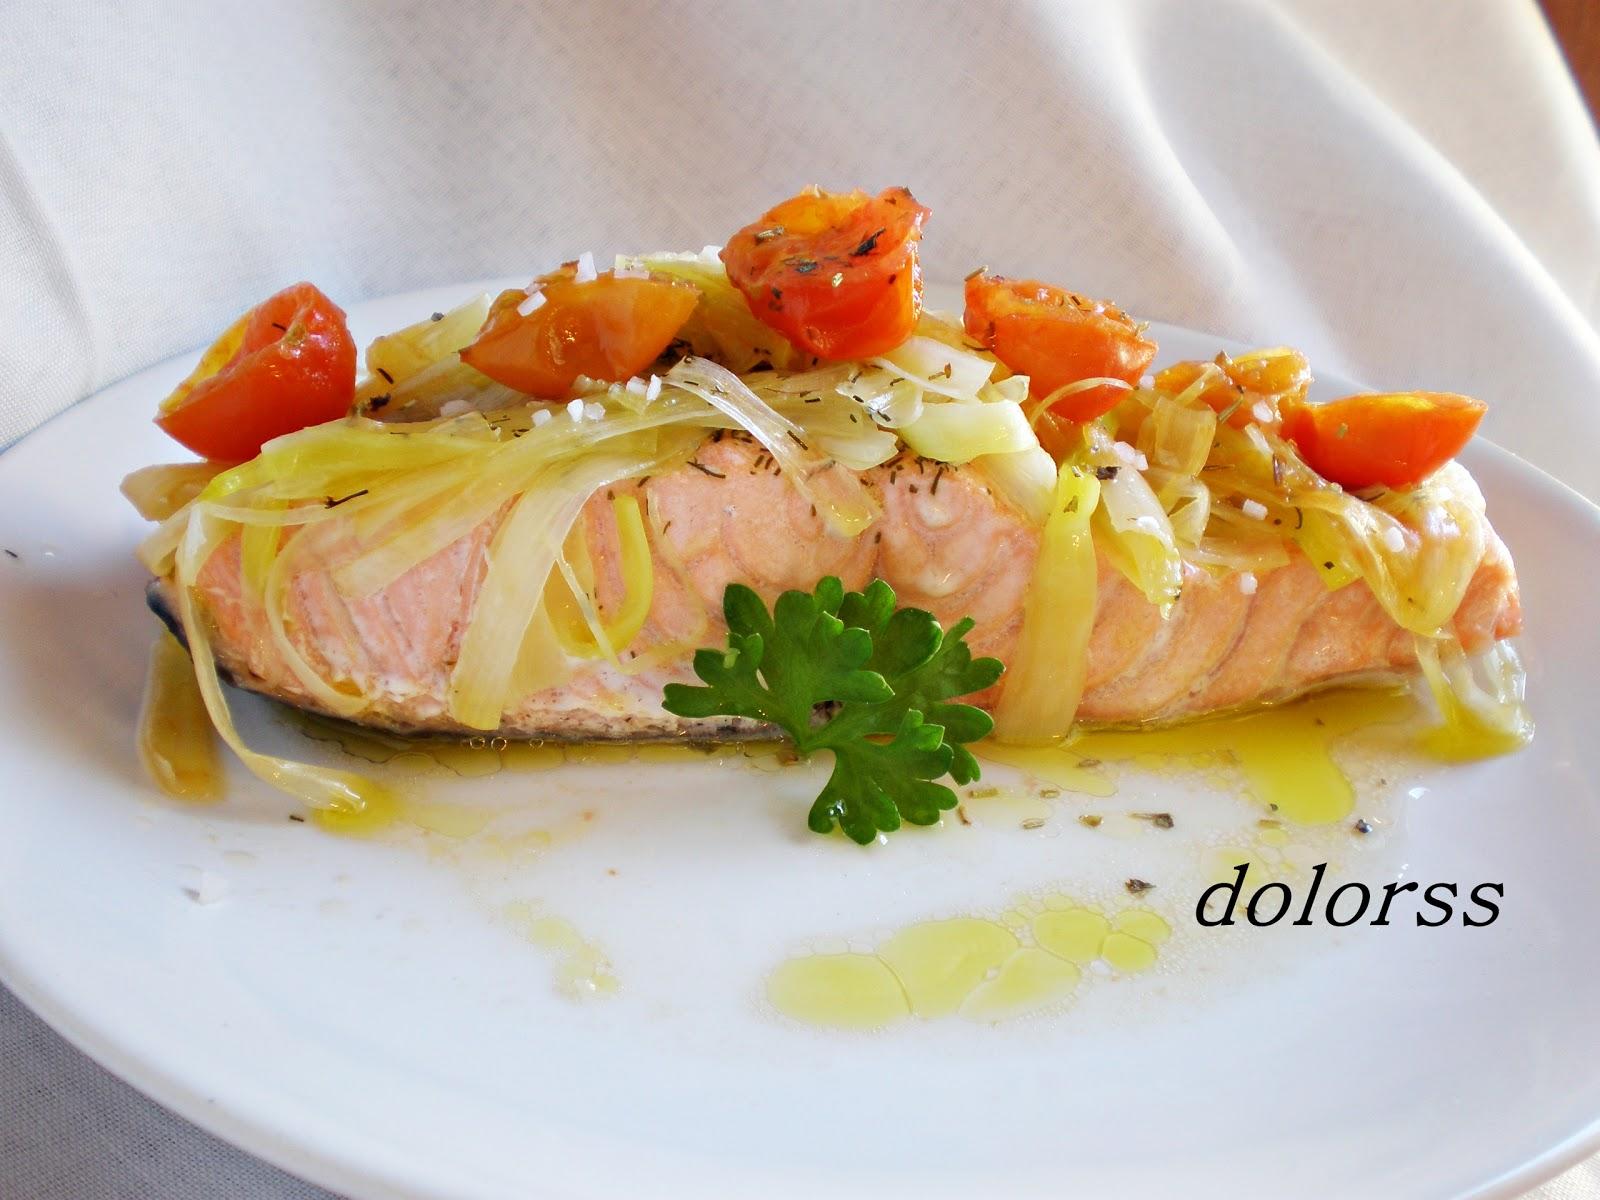 http://blogdecuina.blogspot.com.es/2008/03/salmn-con-puerro-y-tomates-cherry-micro.html